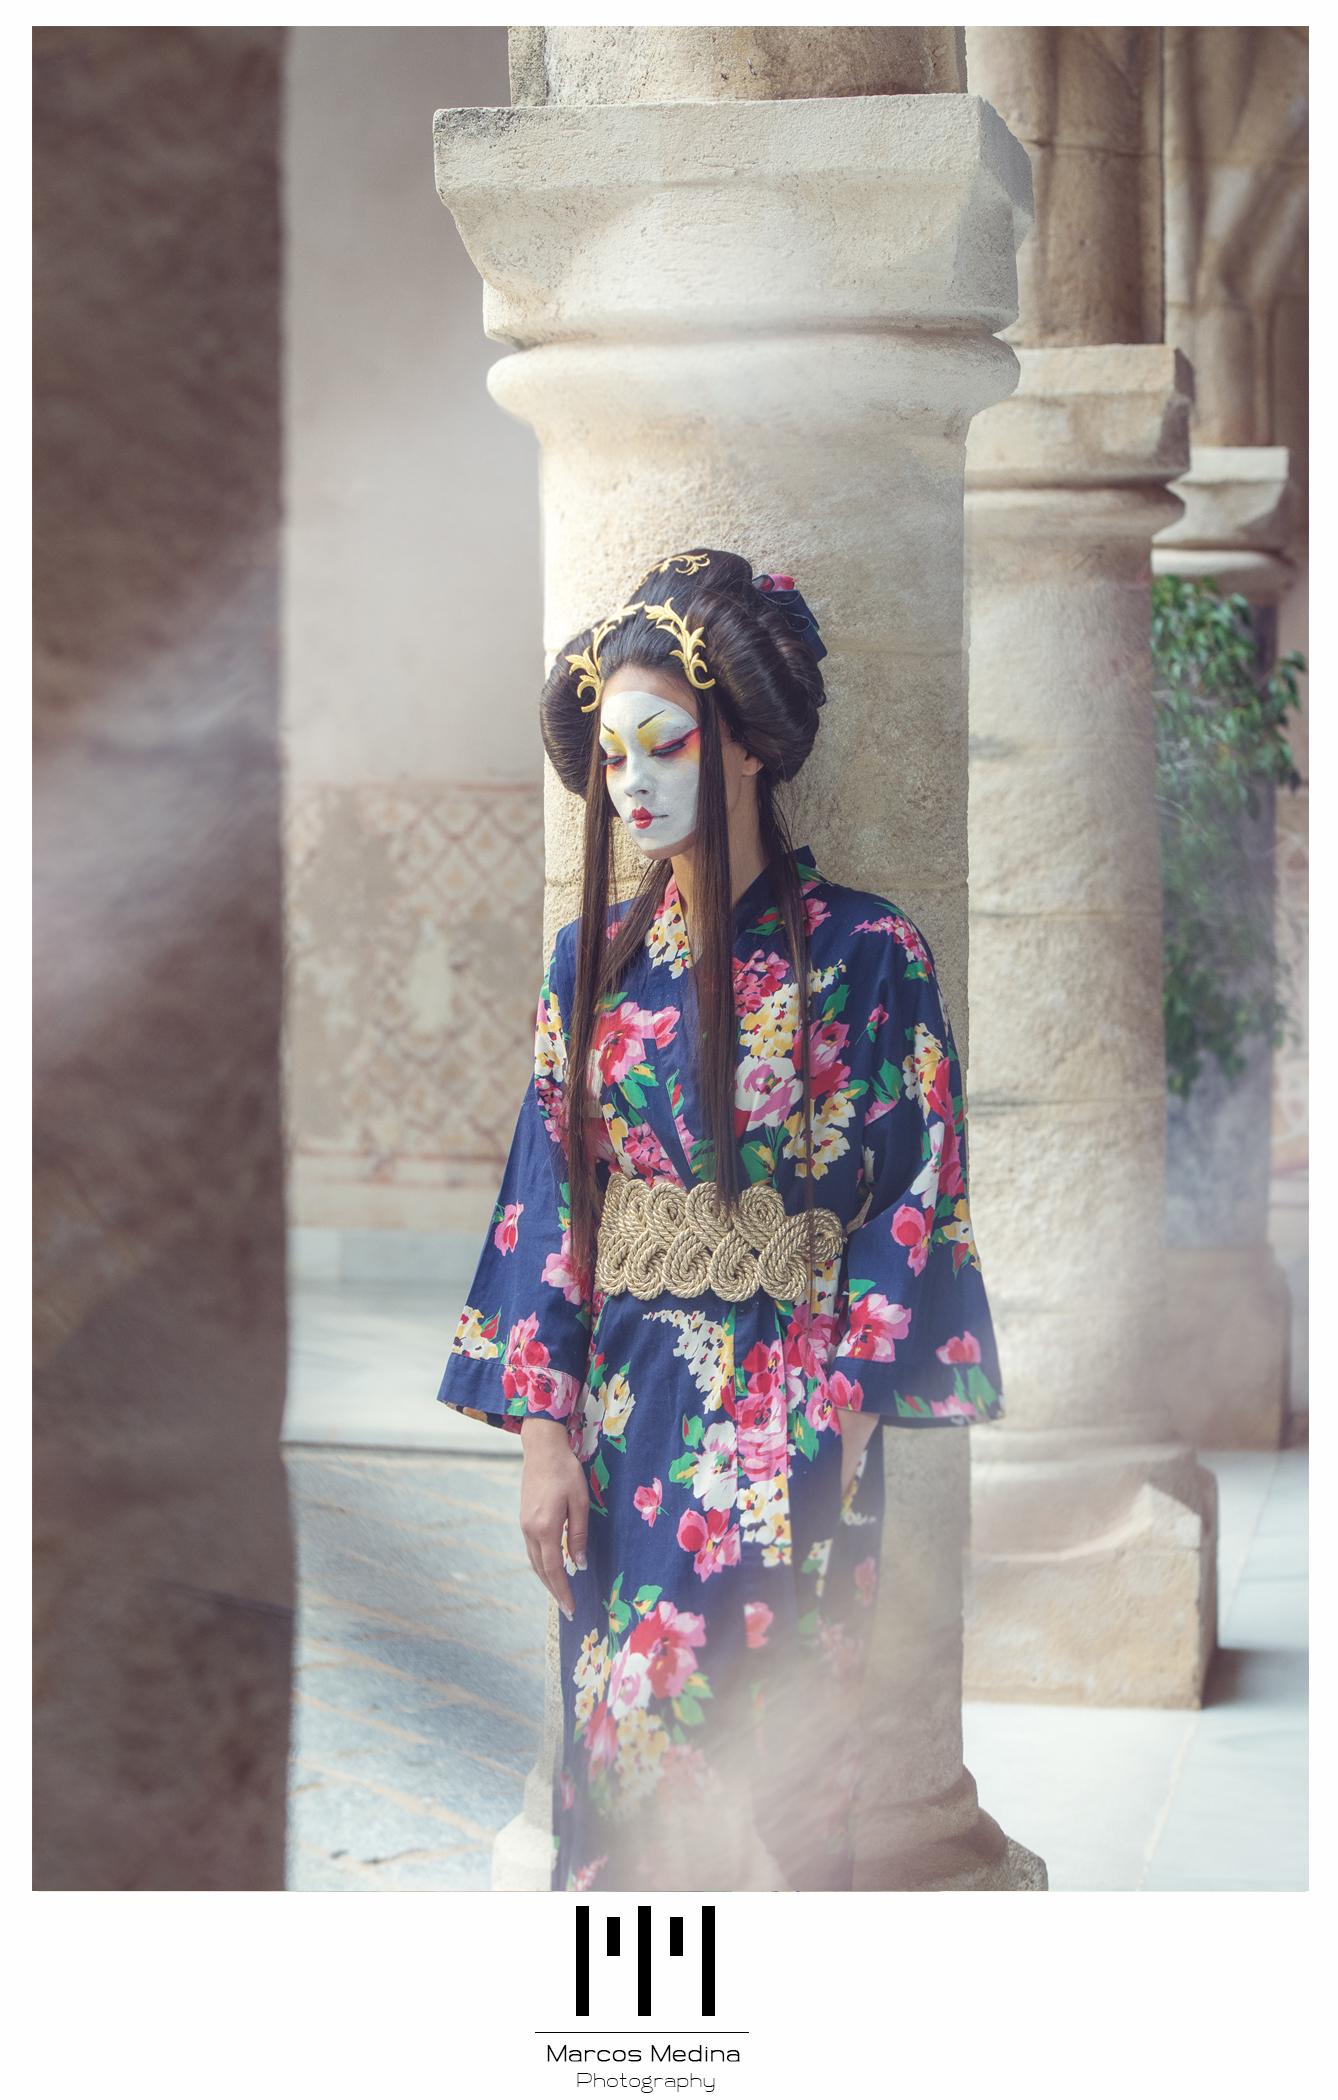 Marcos_Medina_Photography_Geisha_2